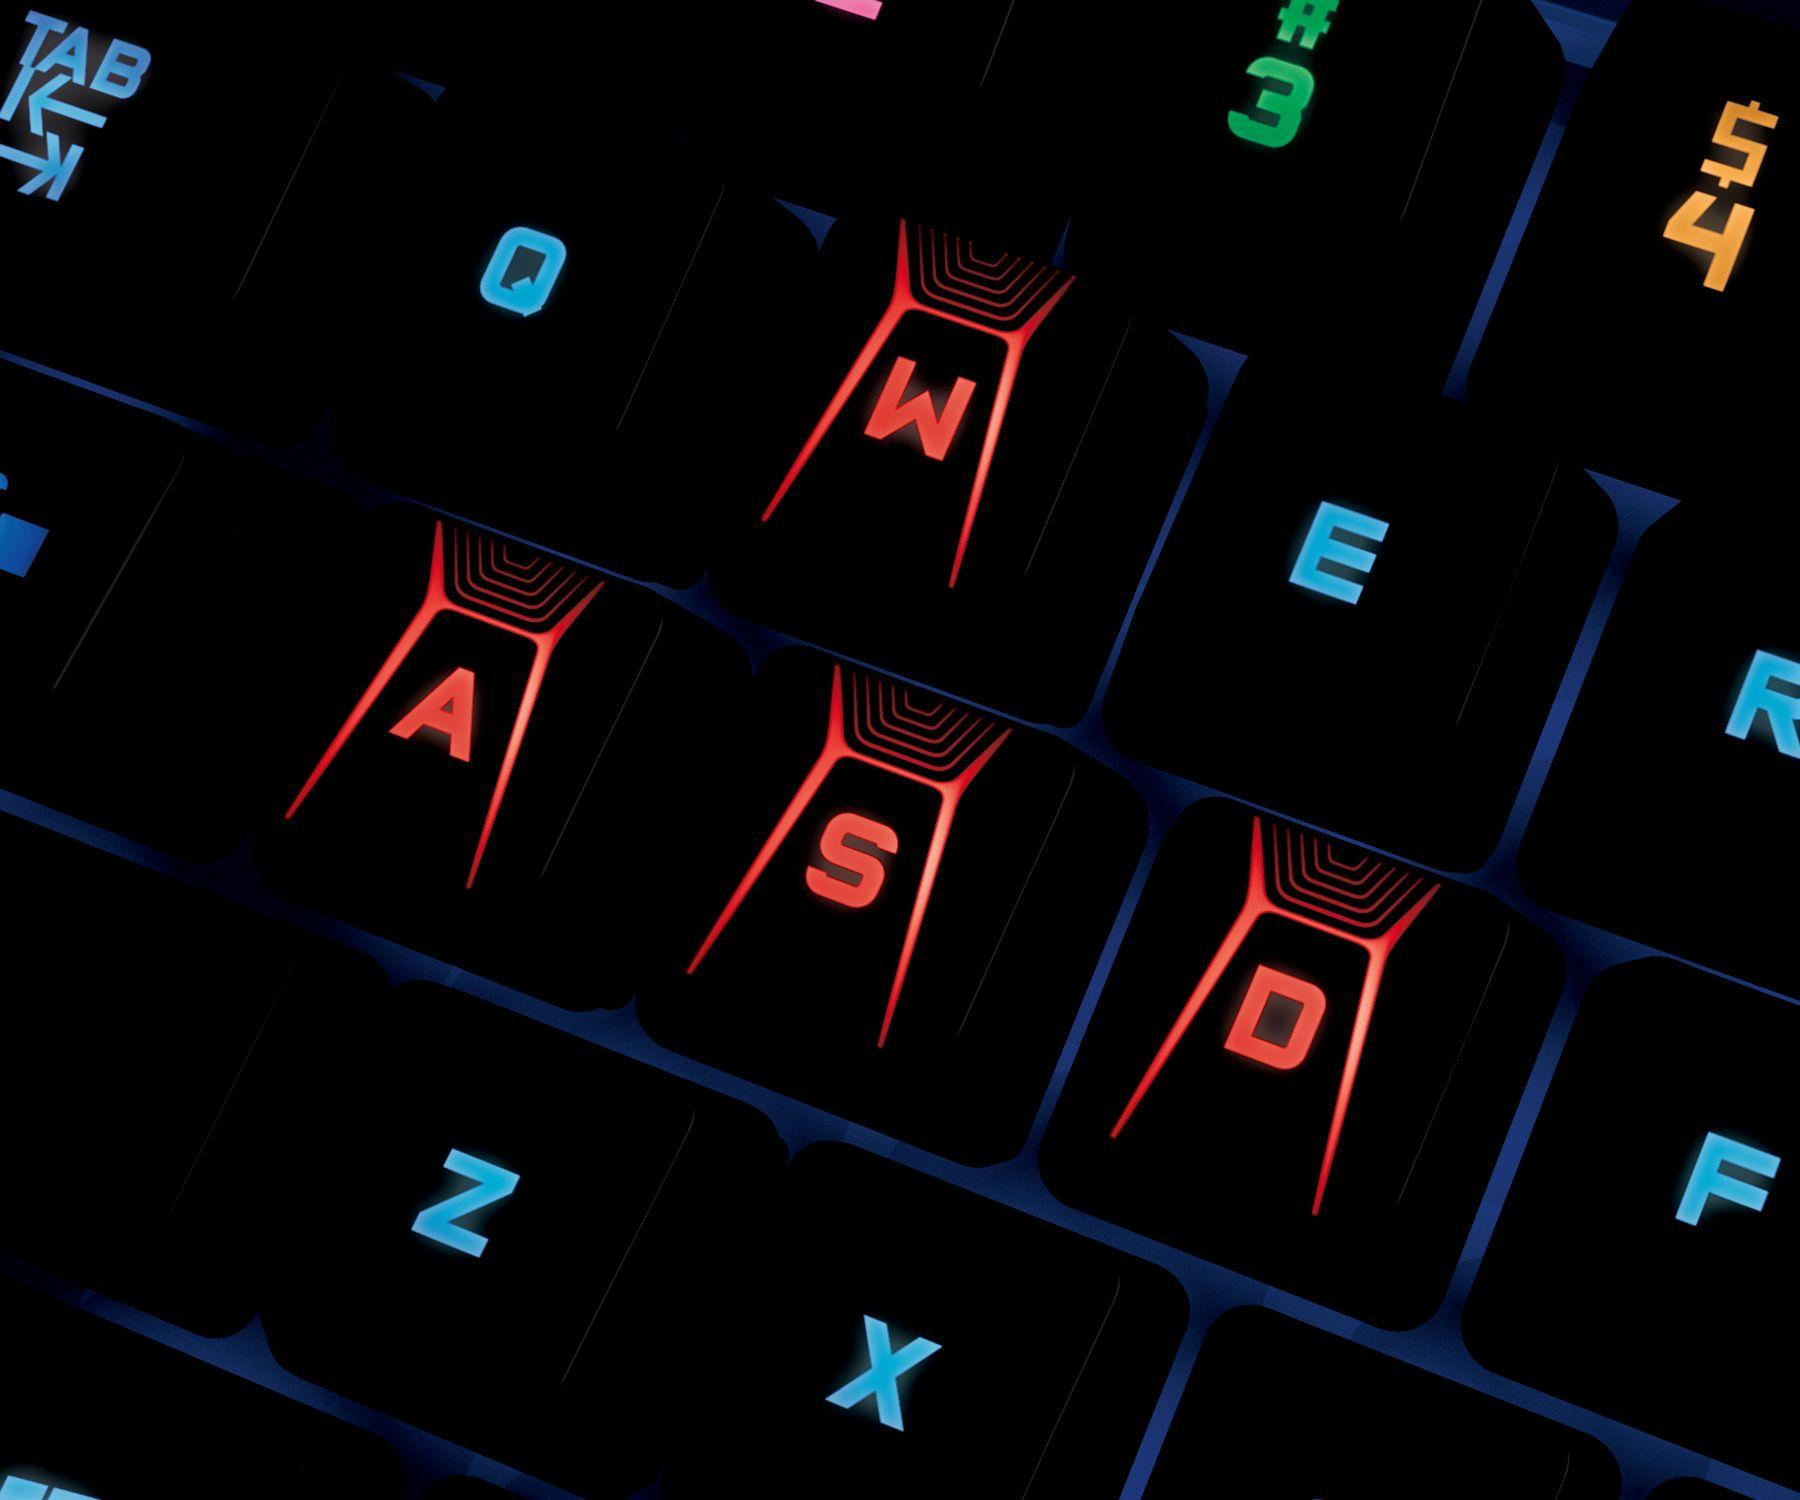 Logitech G prezintă tastatura de gaming mecanică tenkeyless